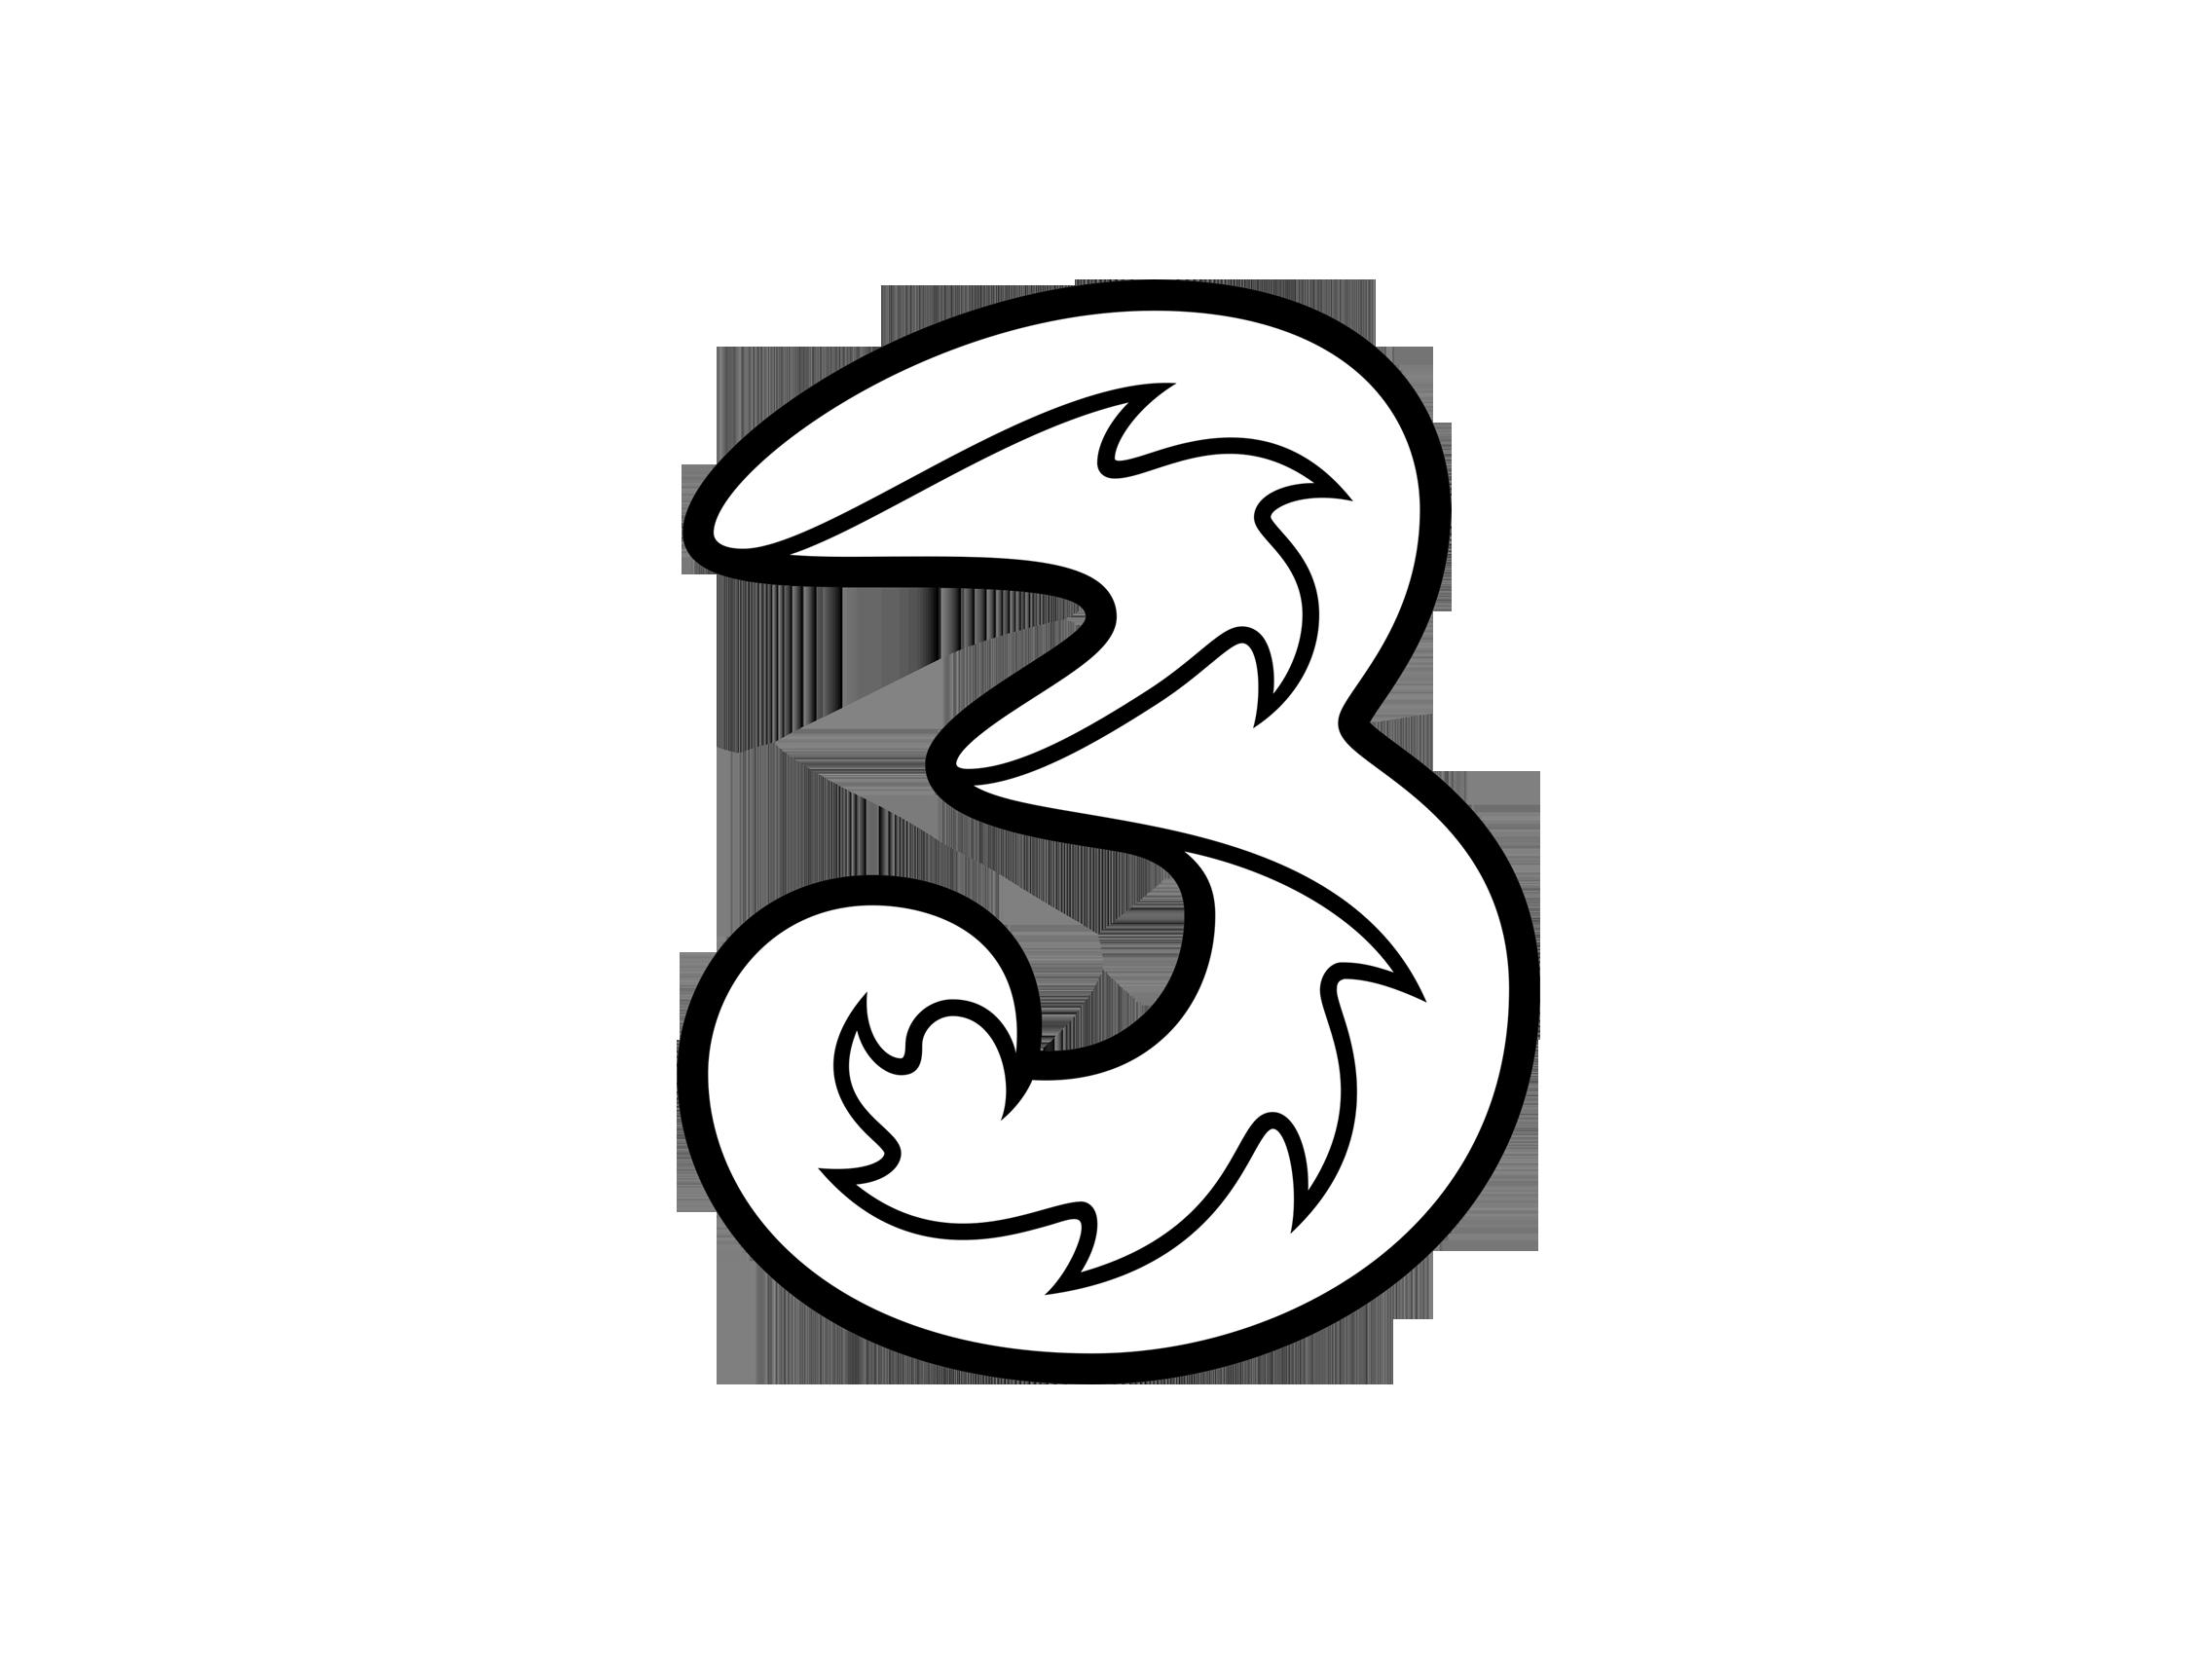 Hutchison-3G-3-brand-logo